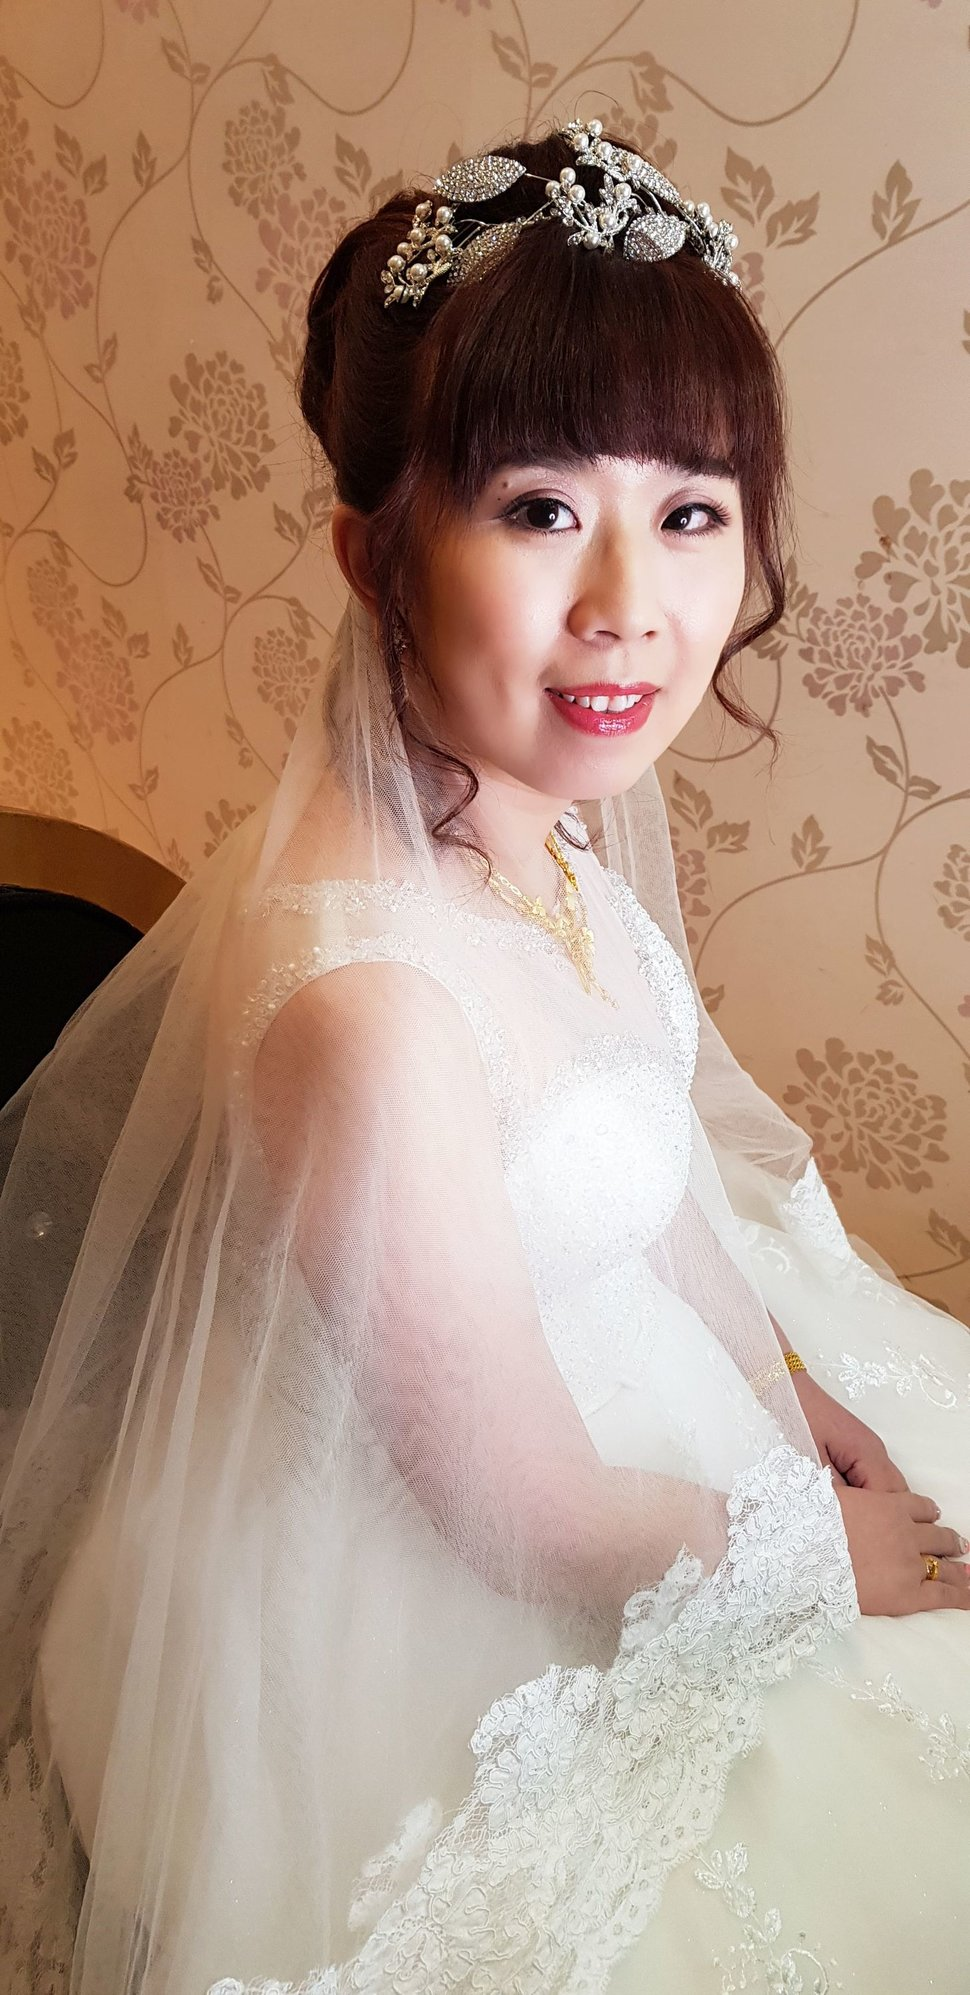 PSFix_20191012_115324 - 漾時尚婚禮整體造型總監蘇蓉蓉《結婚吧》